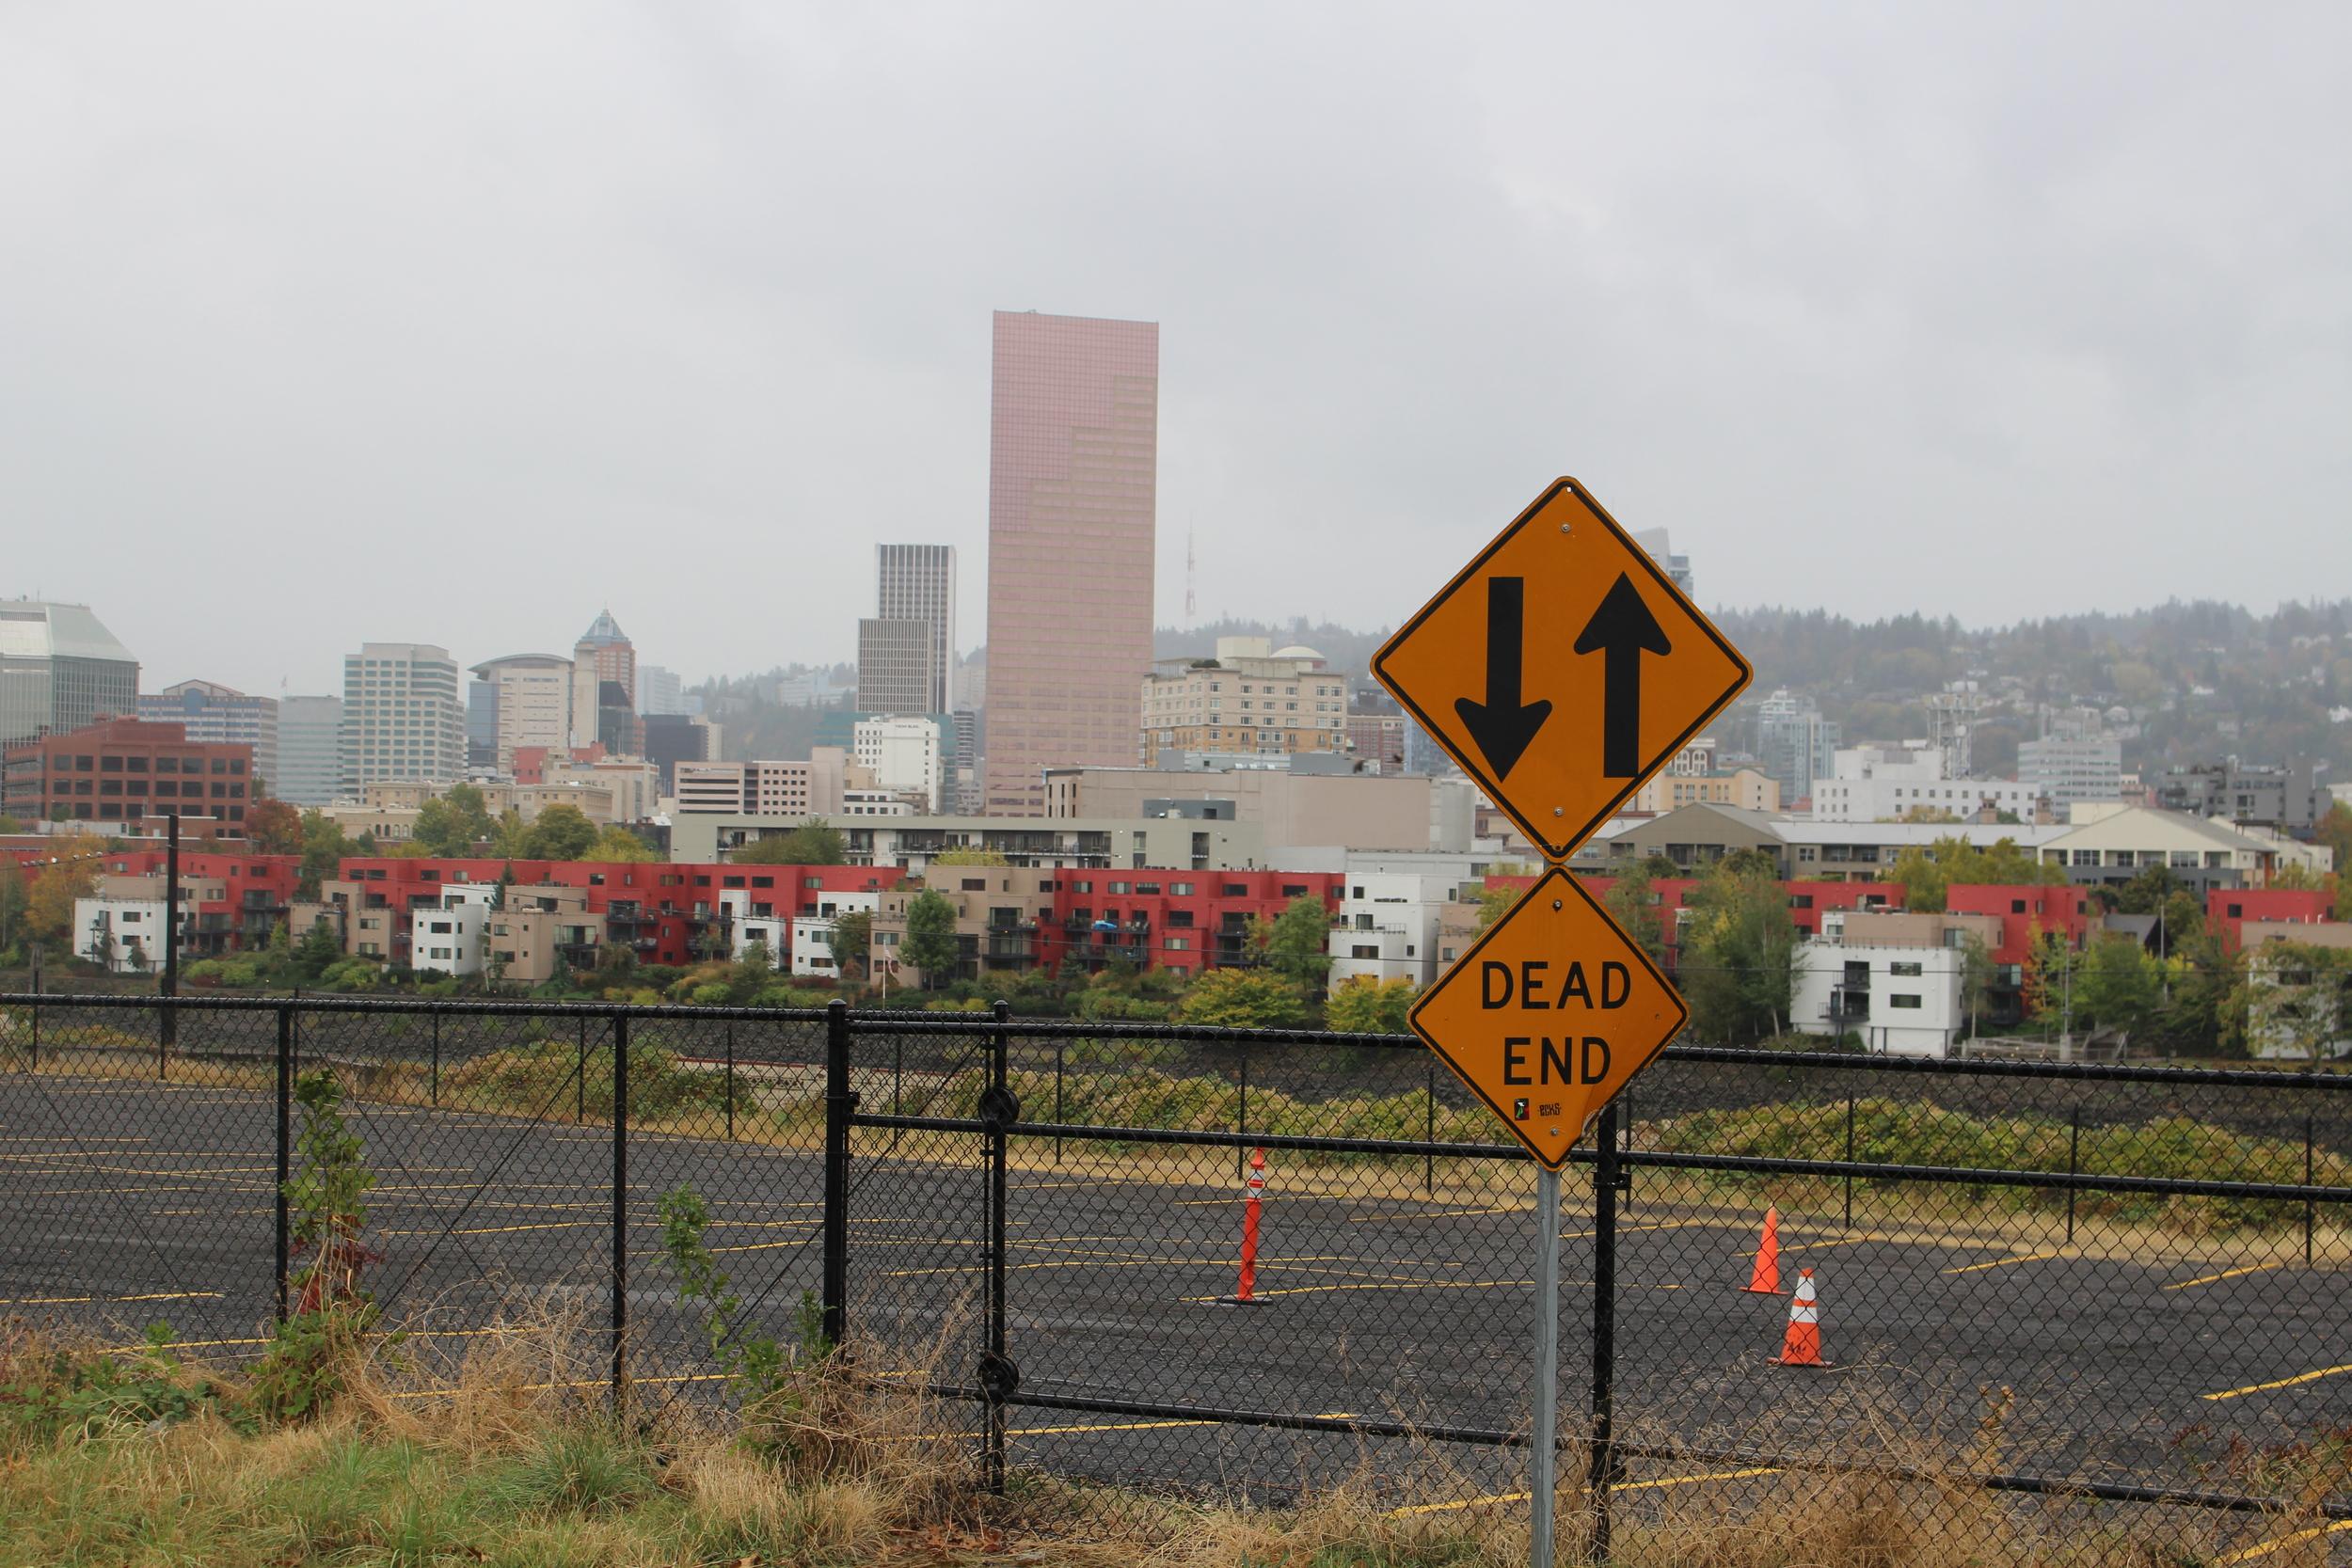 @Portland